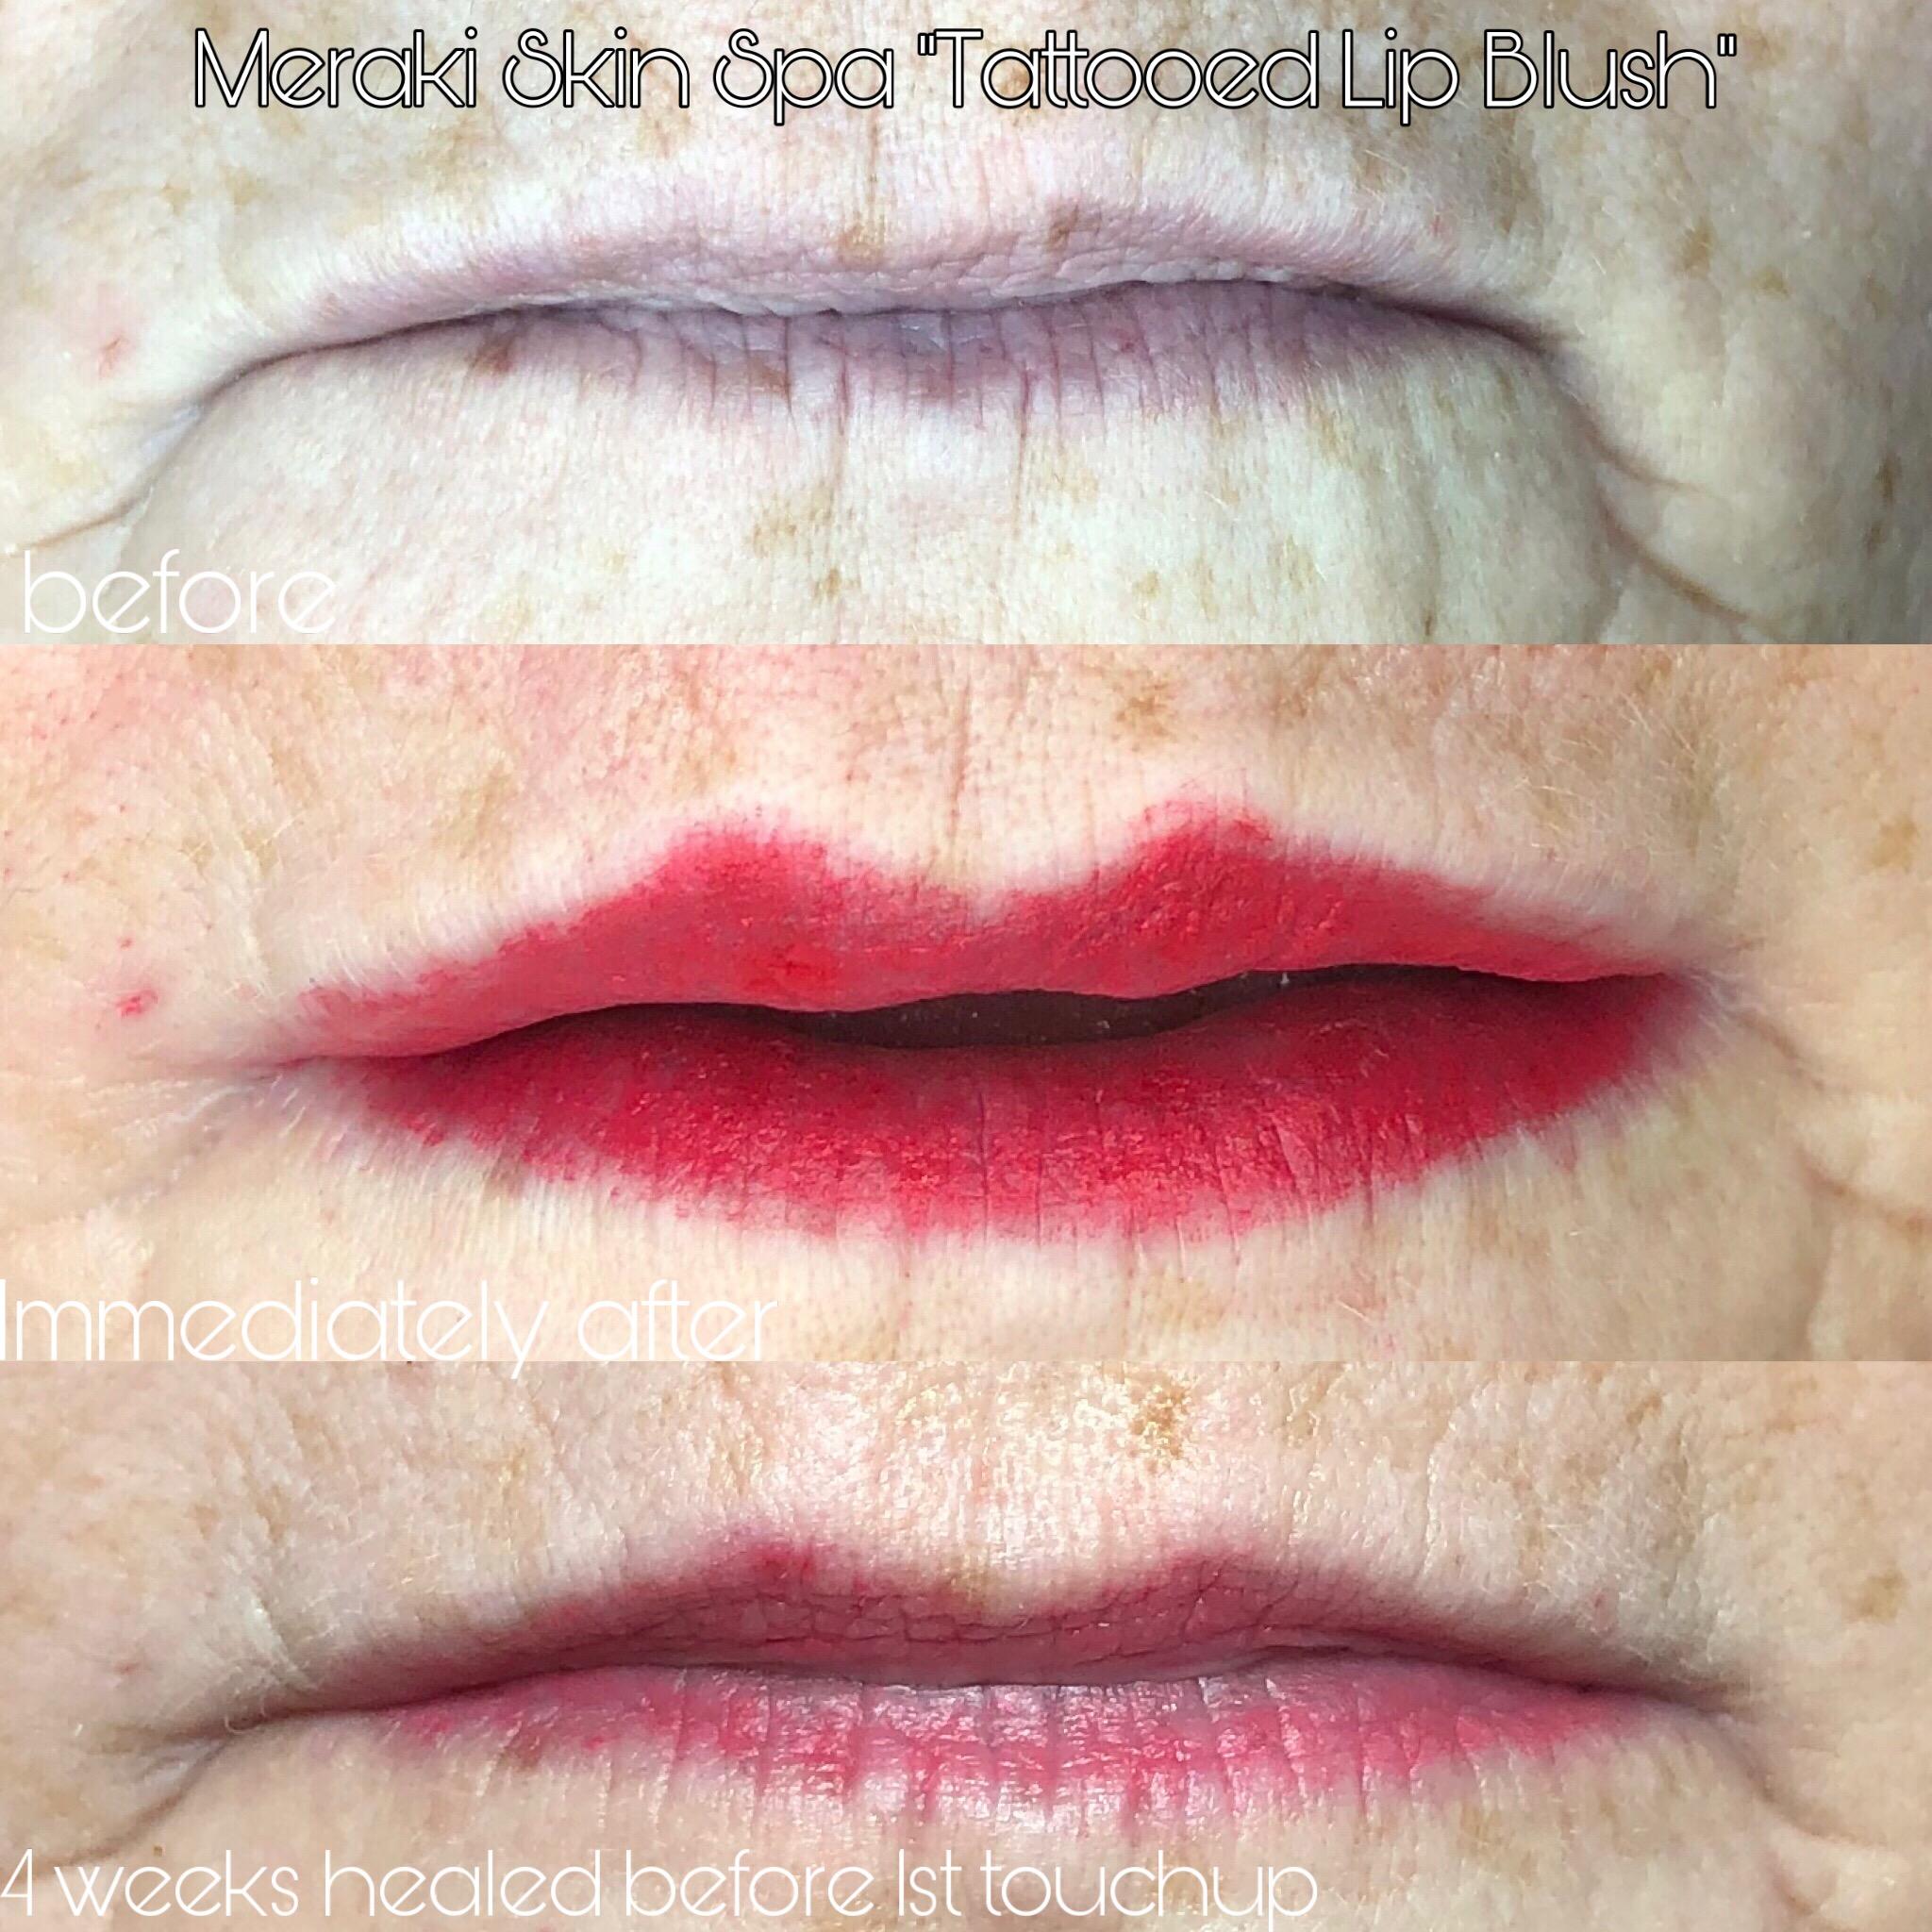 lip tattooing progression pic permanent makeup meridian Idaho alt text